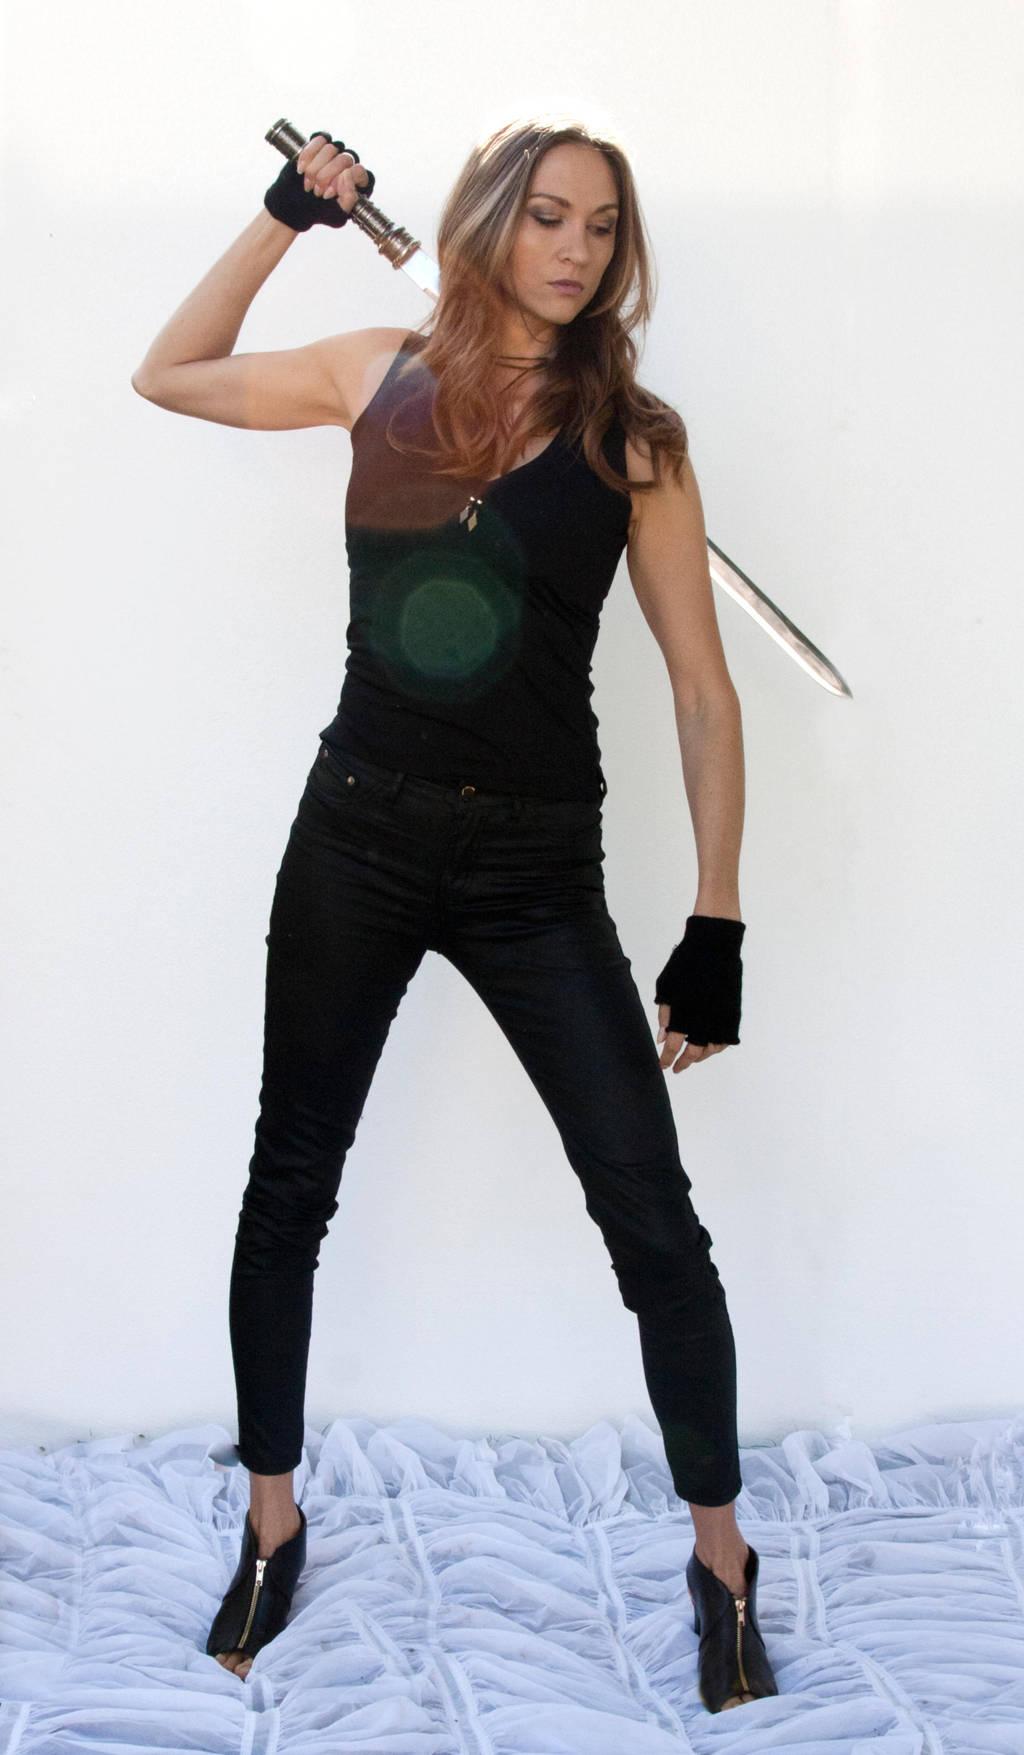 Action pose - woman 11 by CathleenTarawhiti